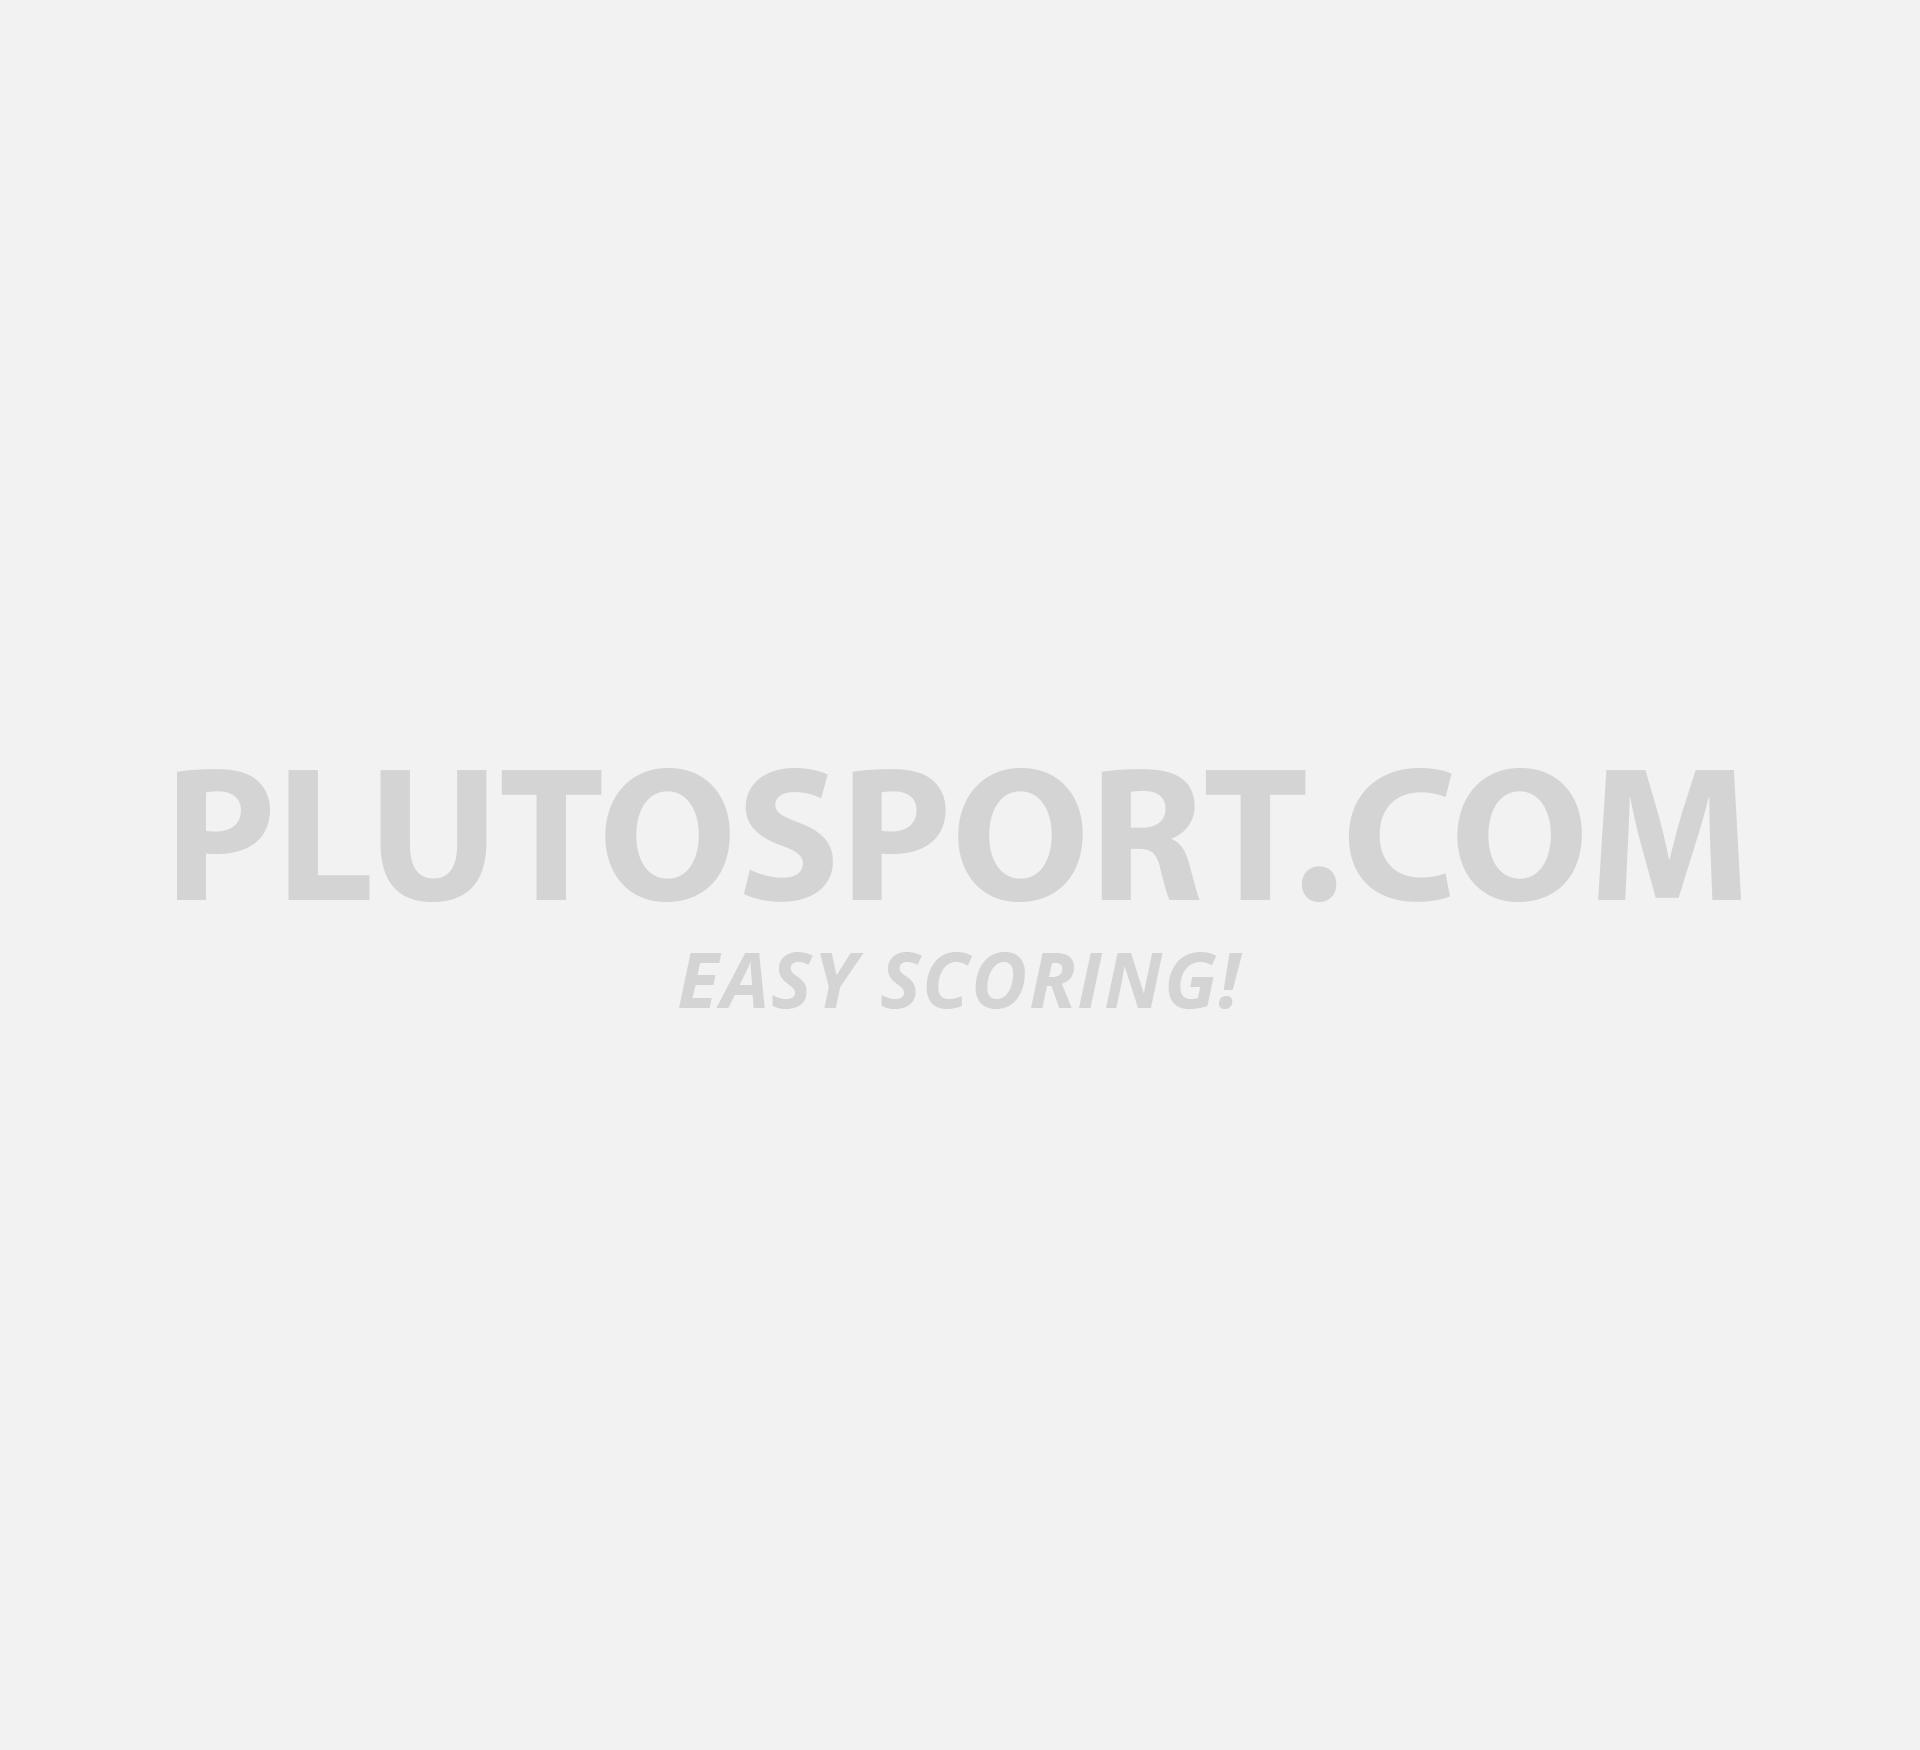 5539503d537 Adidas Response Top Wms - Tops - Shirts - Clothing - Tennis - Sports    Plutosport